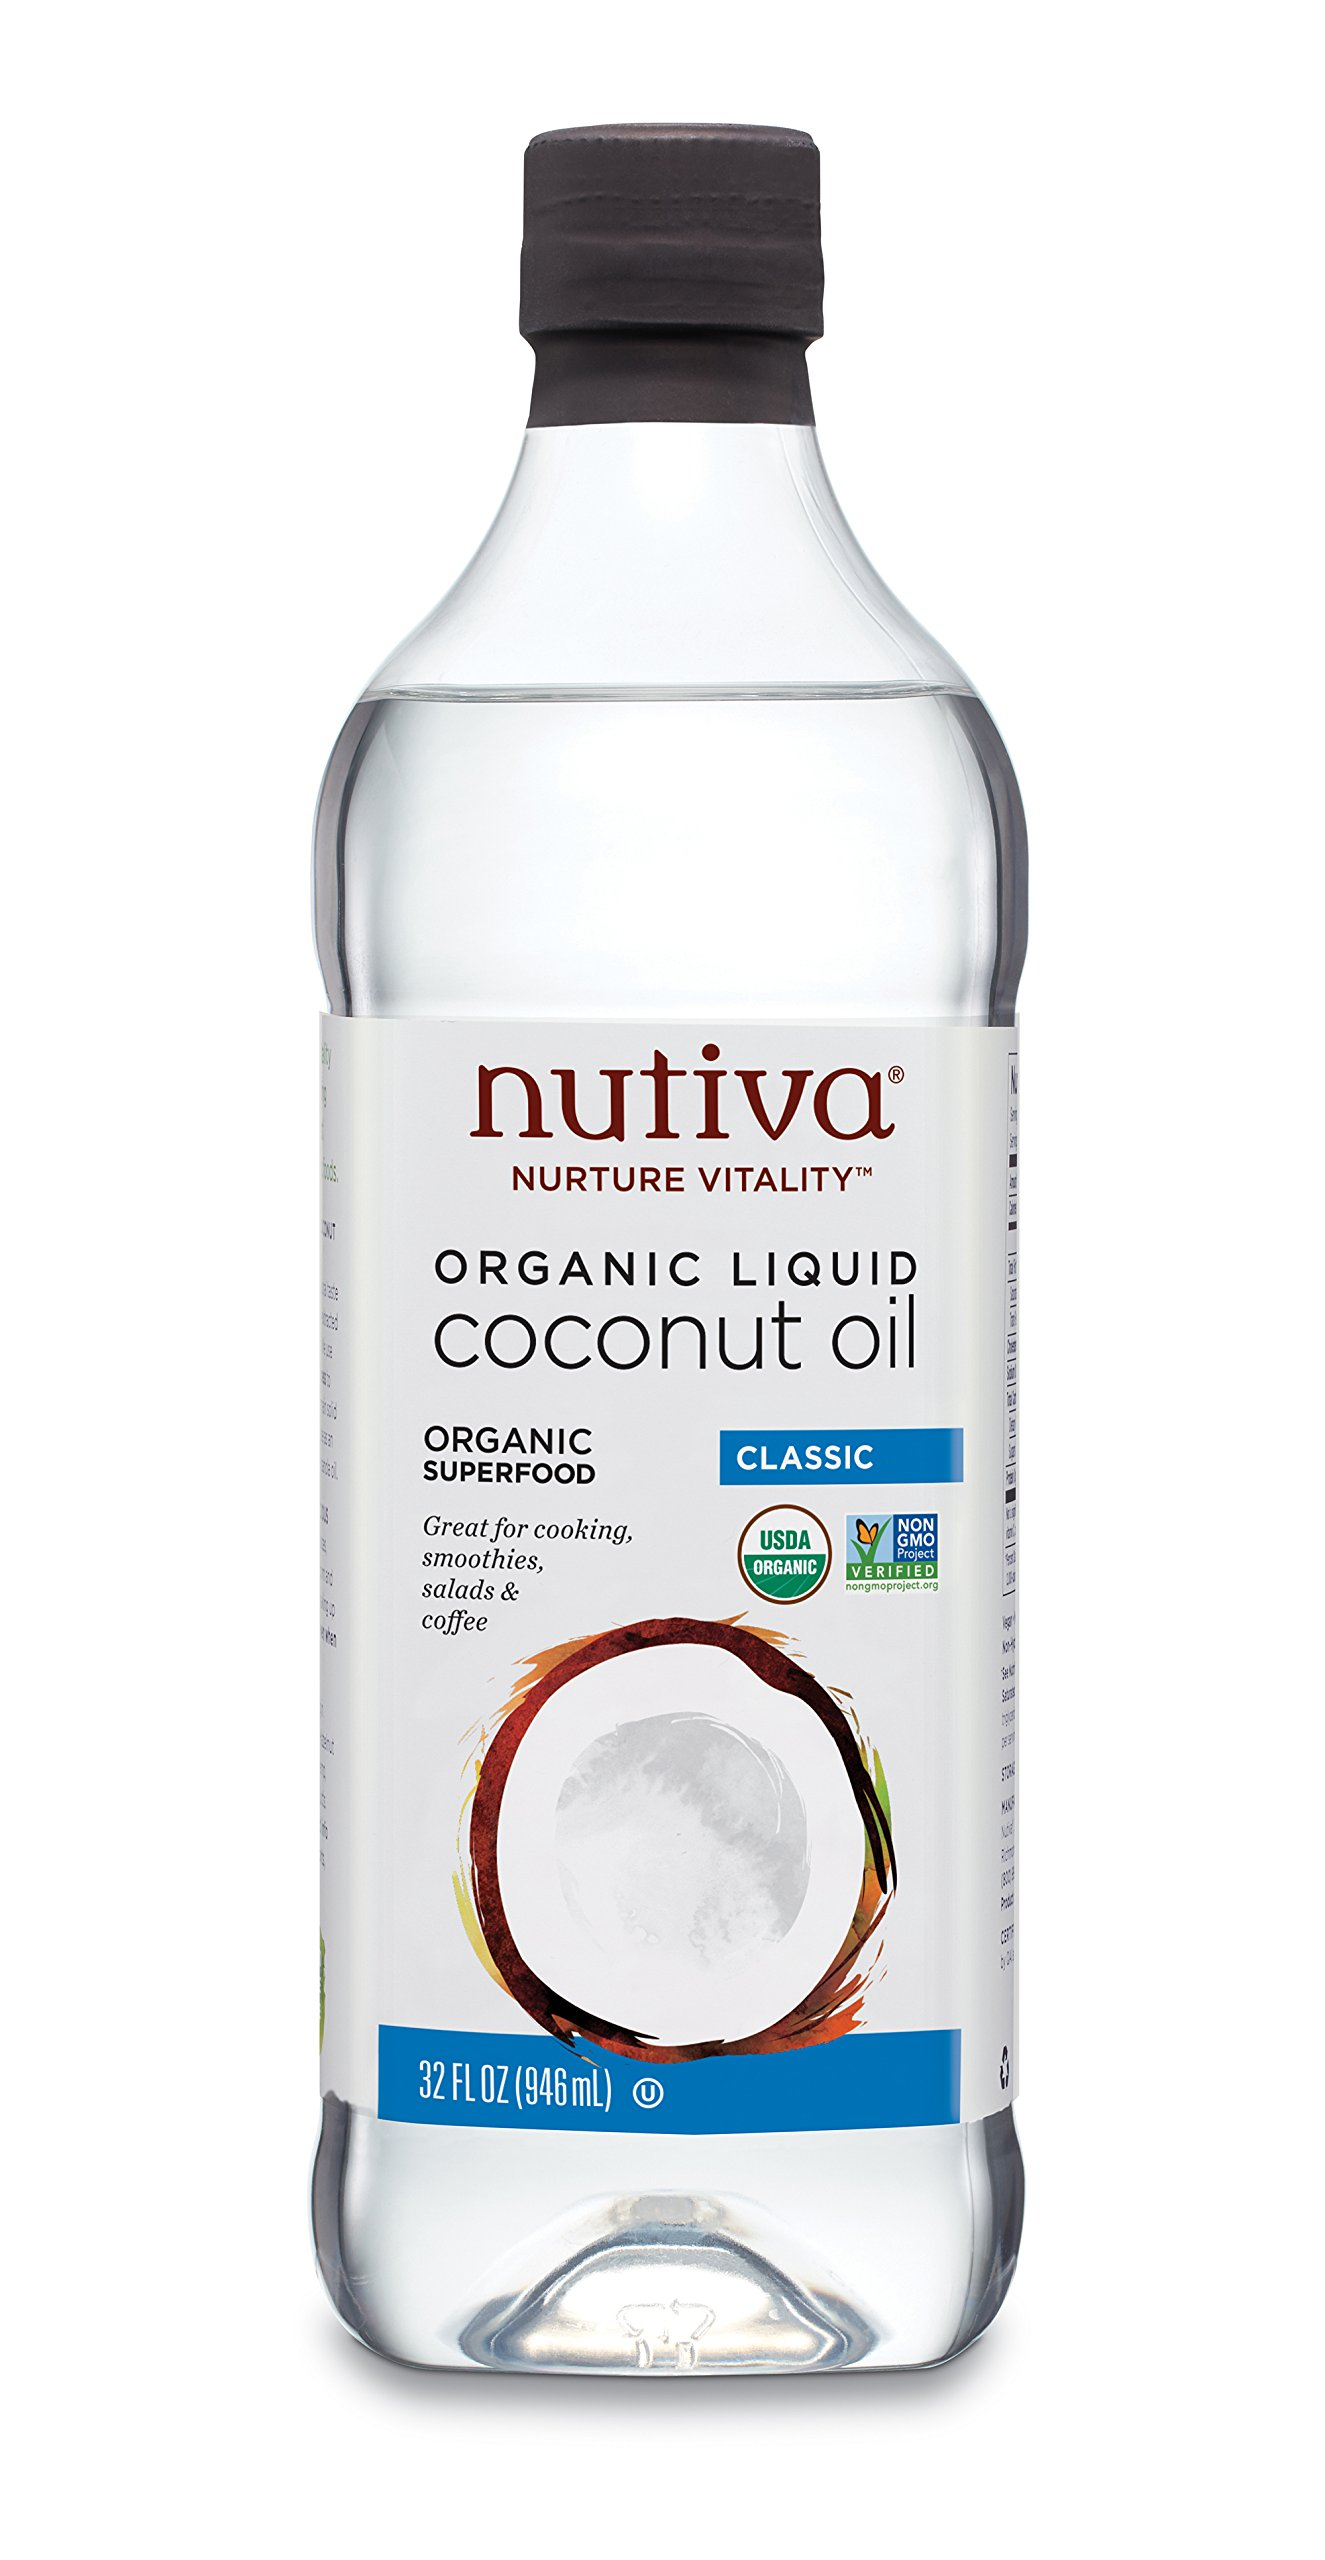 Nutiva Organic, Unrefined, Liquid Coconut Oil from Fresh, non-GMO, Sustainably Farmed Coconuts, 32-ounce by Nutiva (Image #1)